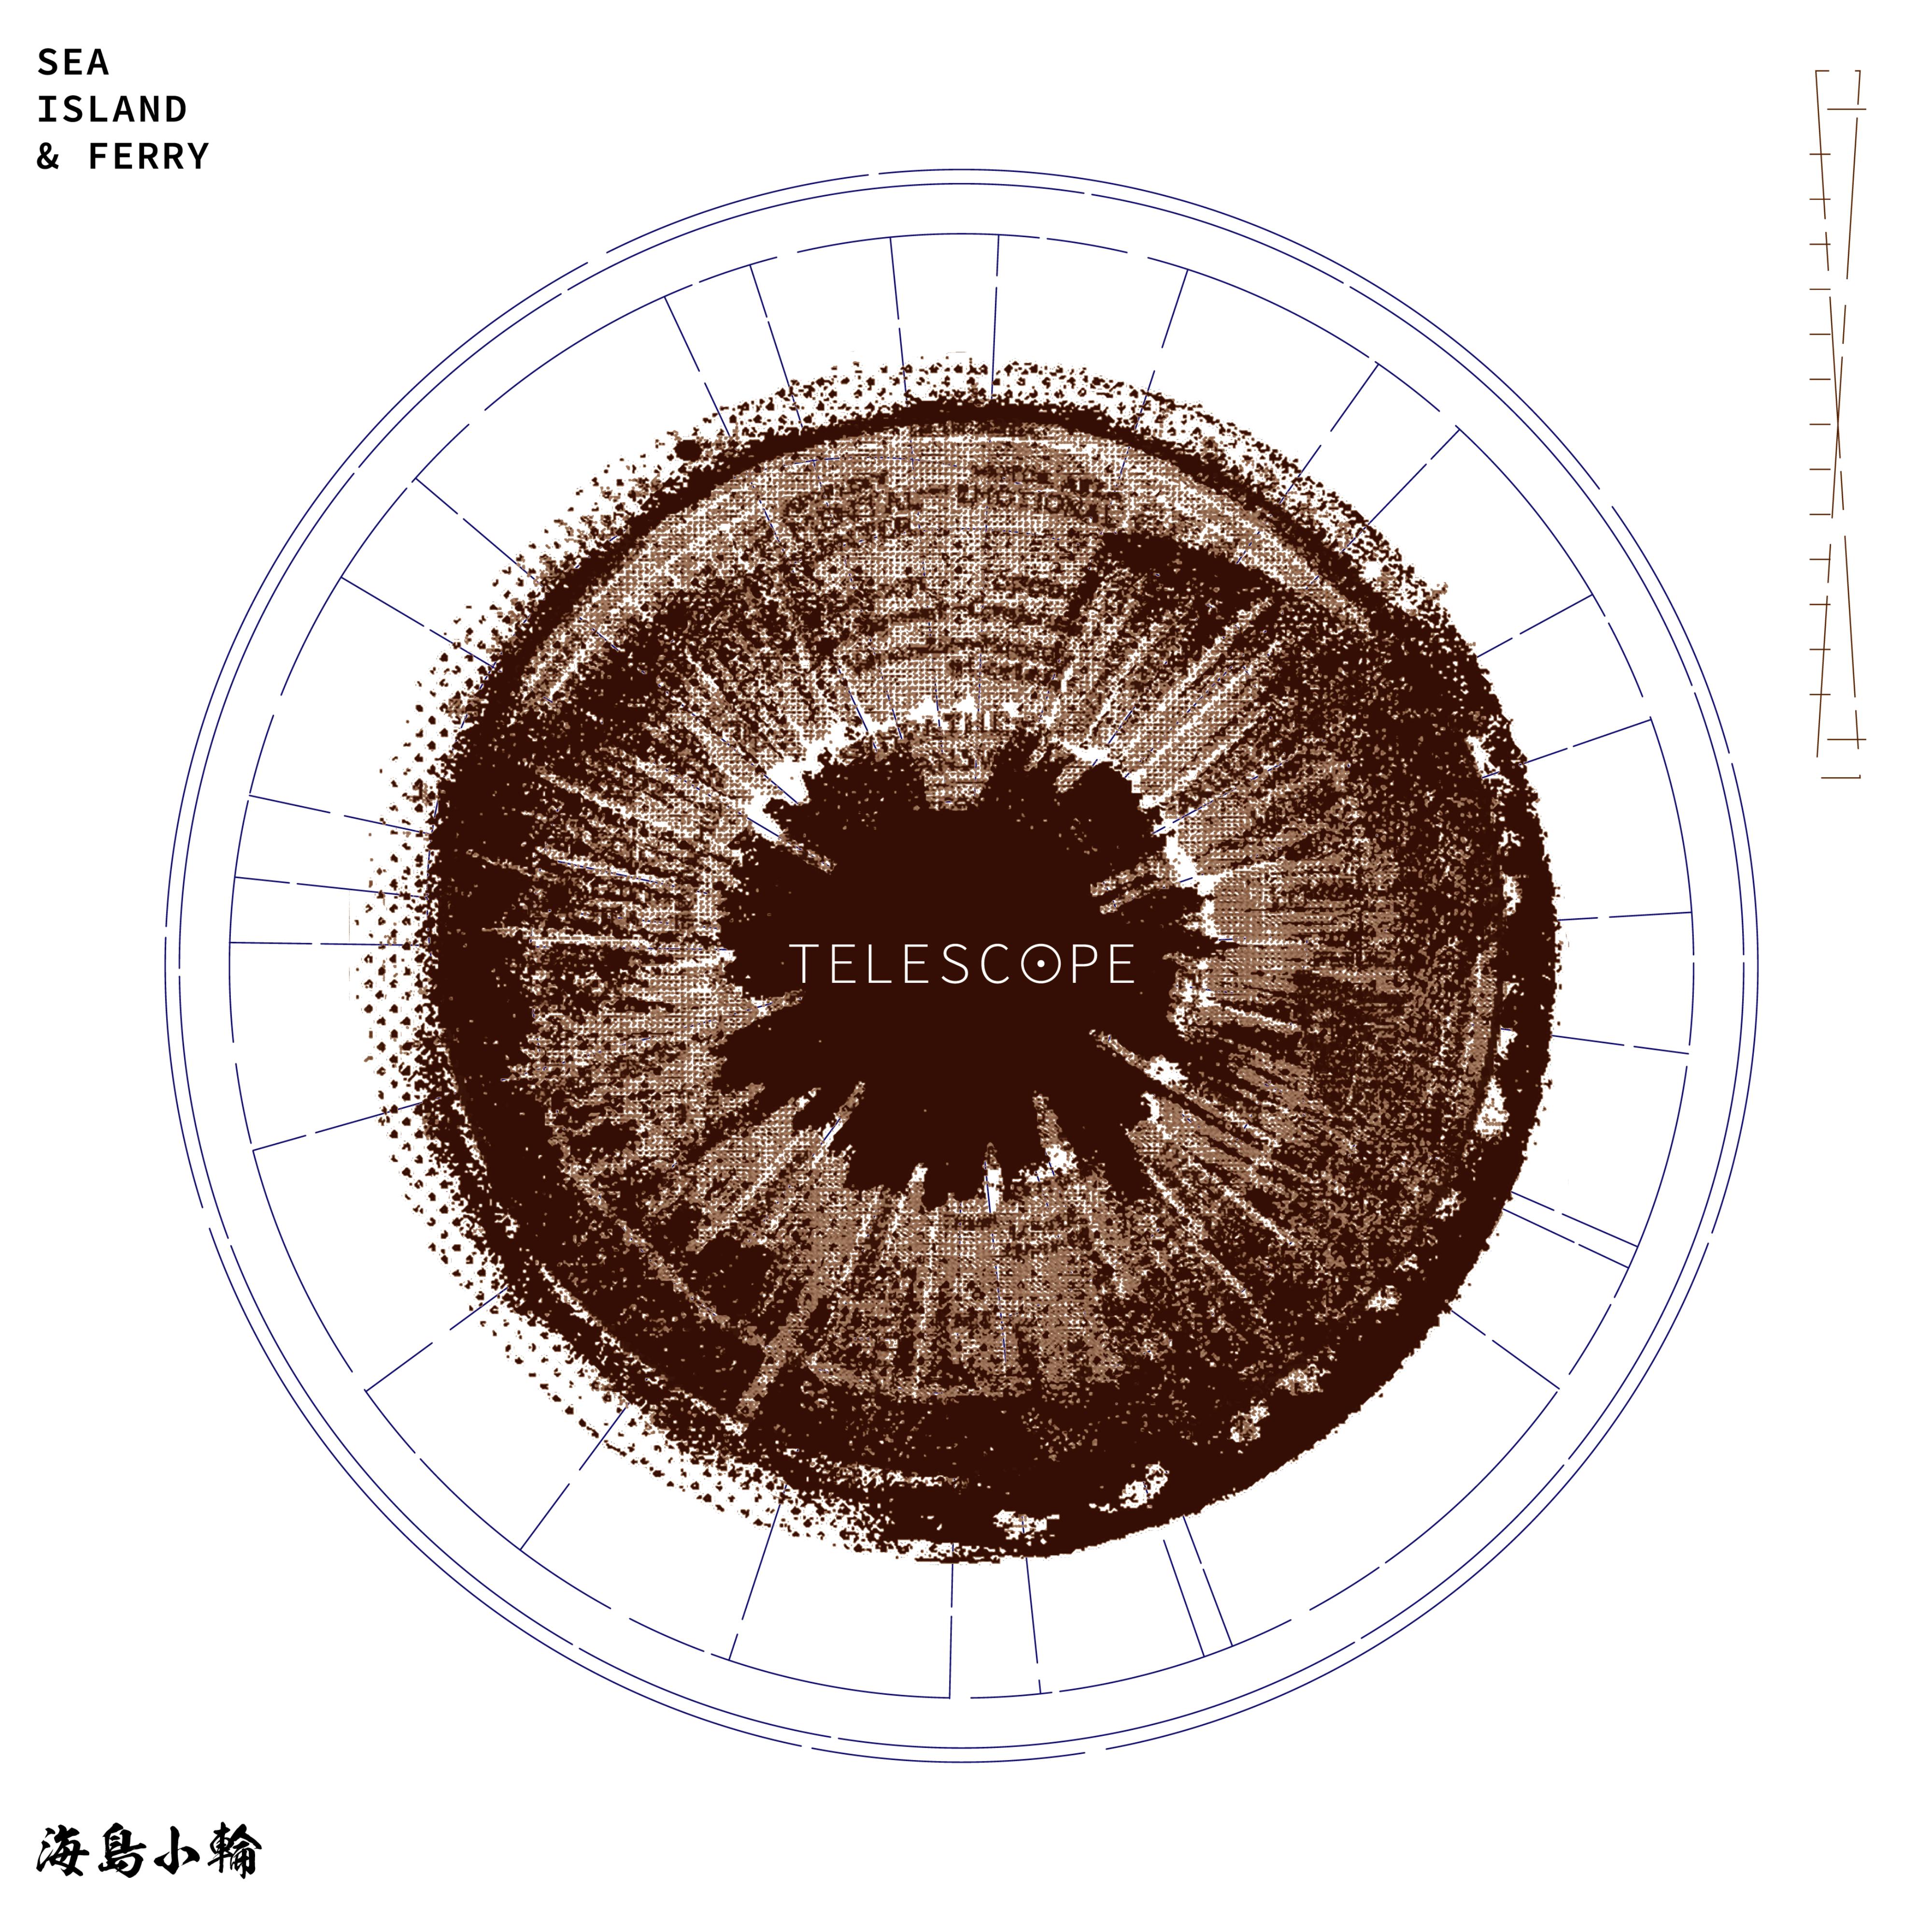 Sea Island & Ferry / 海島小輪「Telescope」(CD / 香港・Hong Kong / 2020)